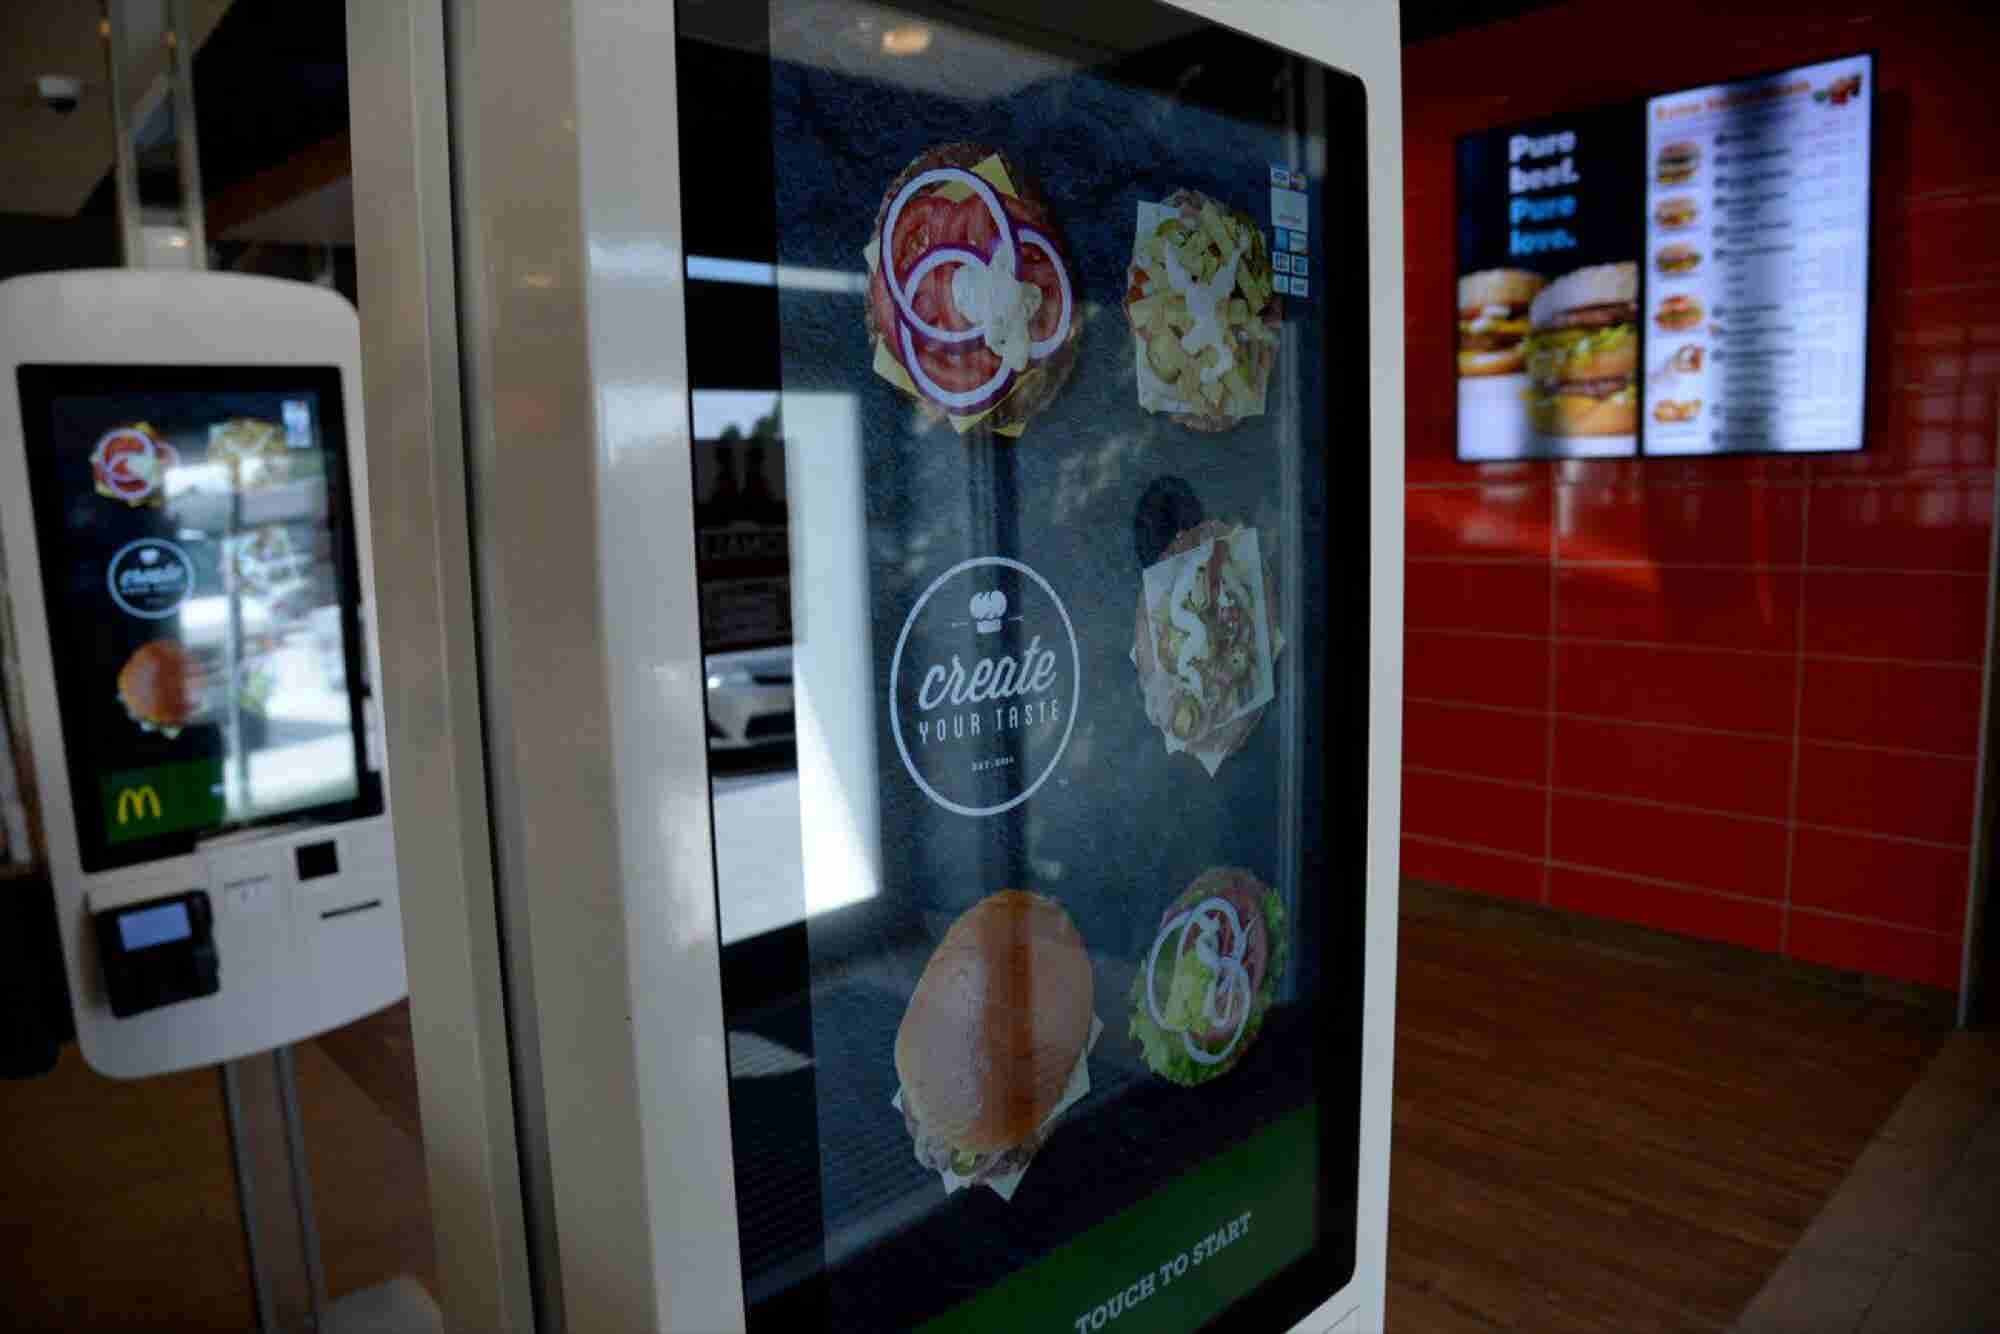 McDonald's Is Adding Self-Order Kiosks to 1,000 Stores